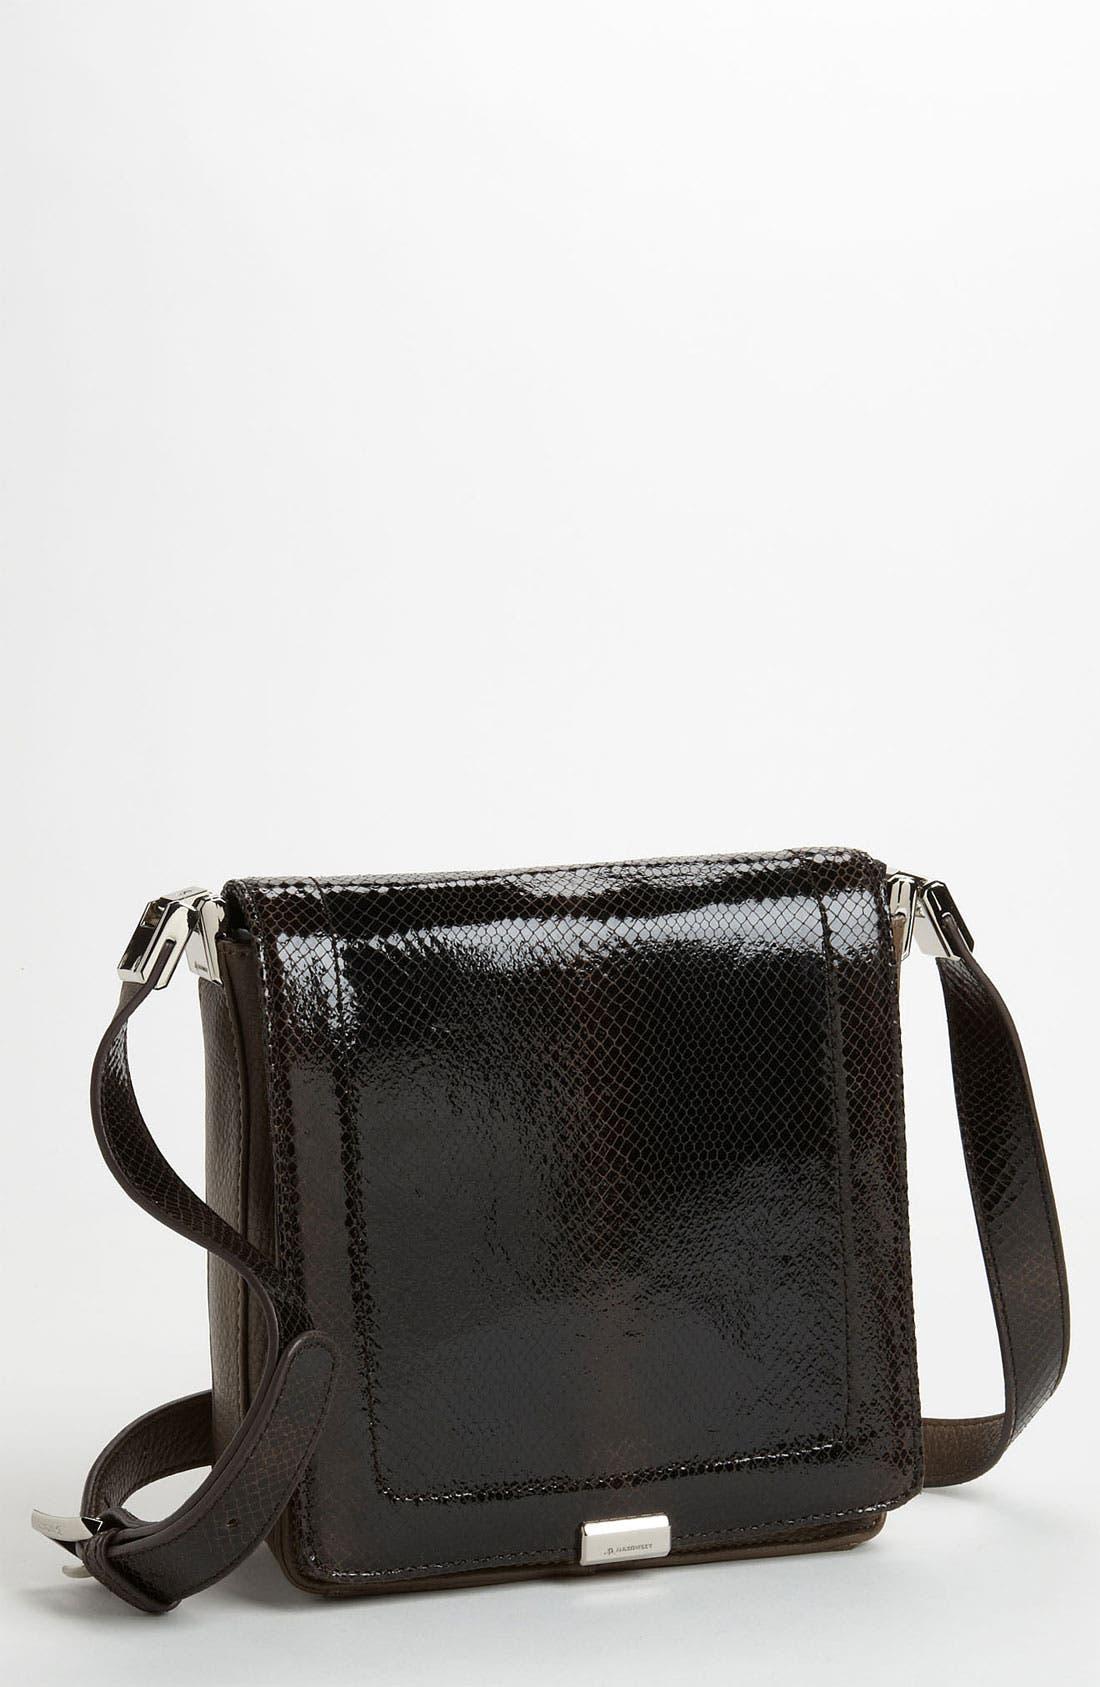 Main Image - B. Makowsky 'Harper' Crossbody Bag